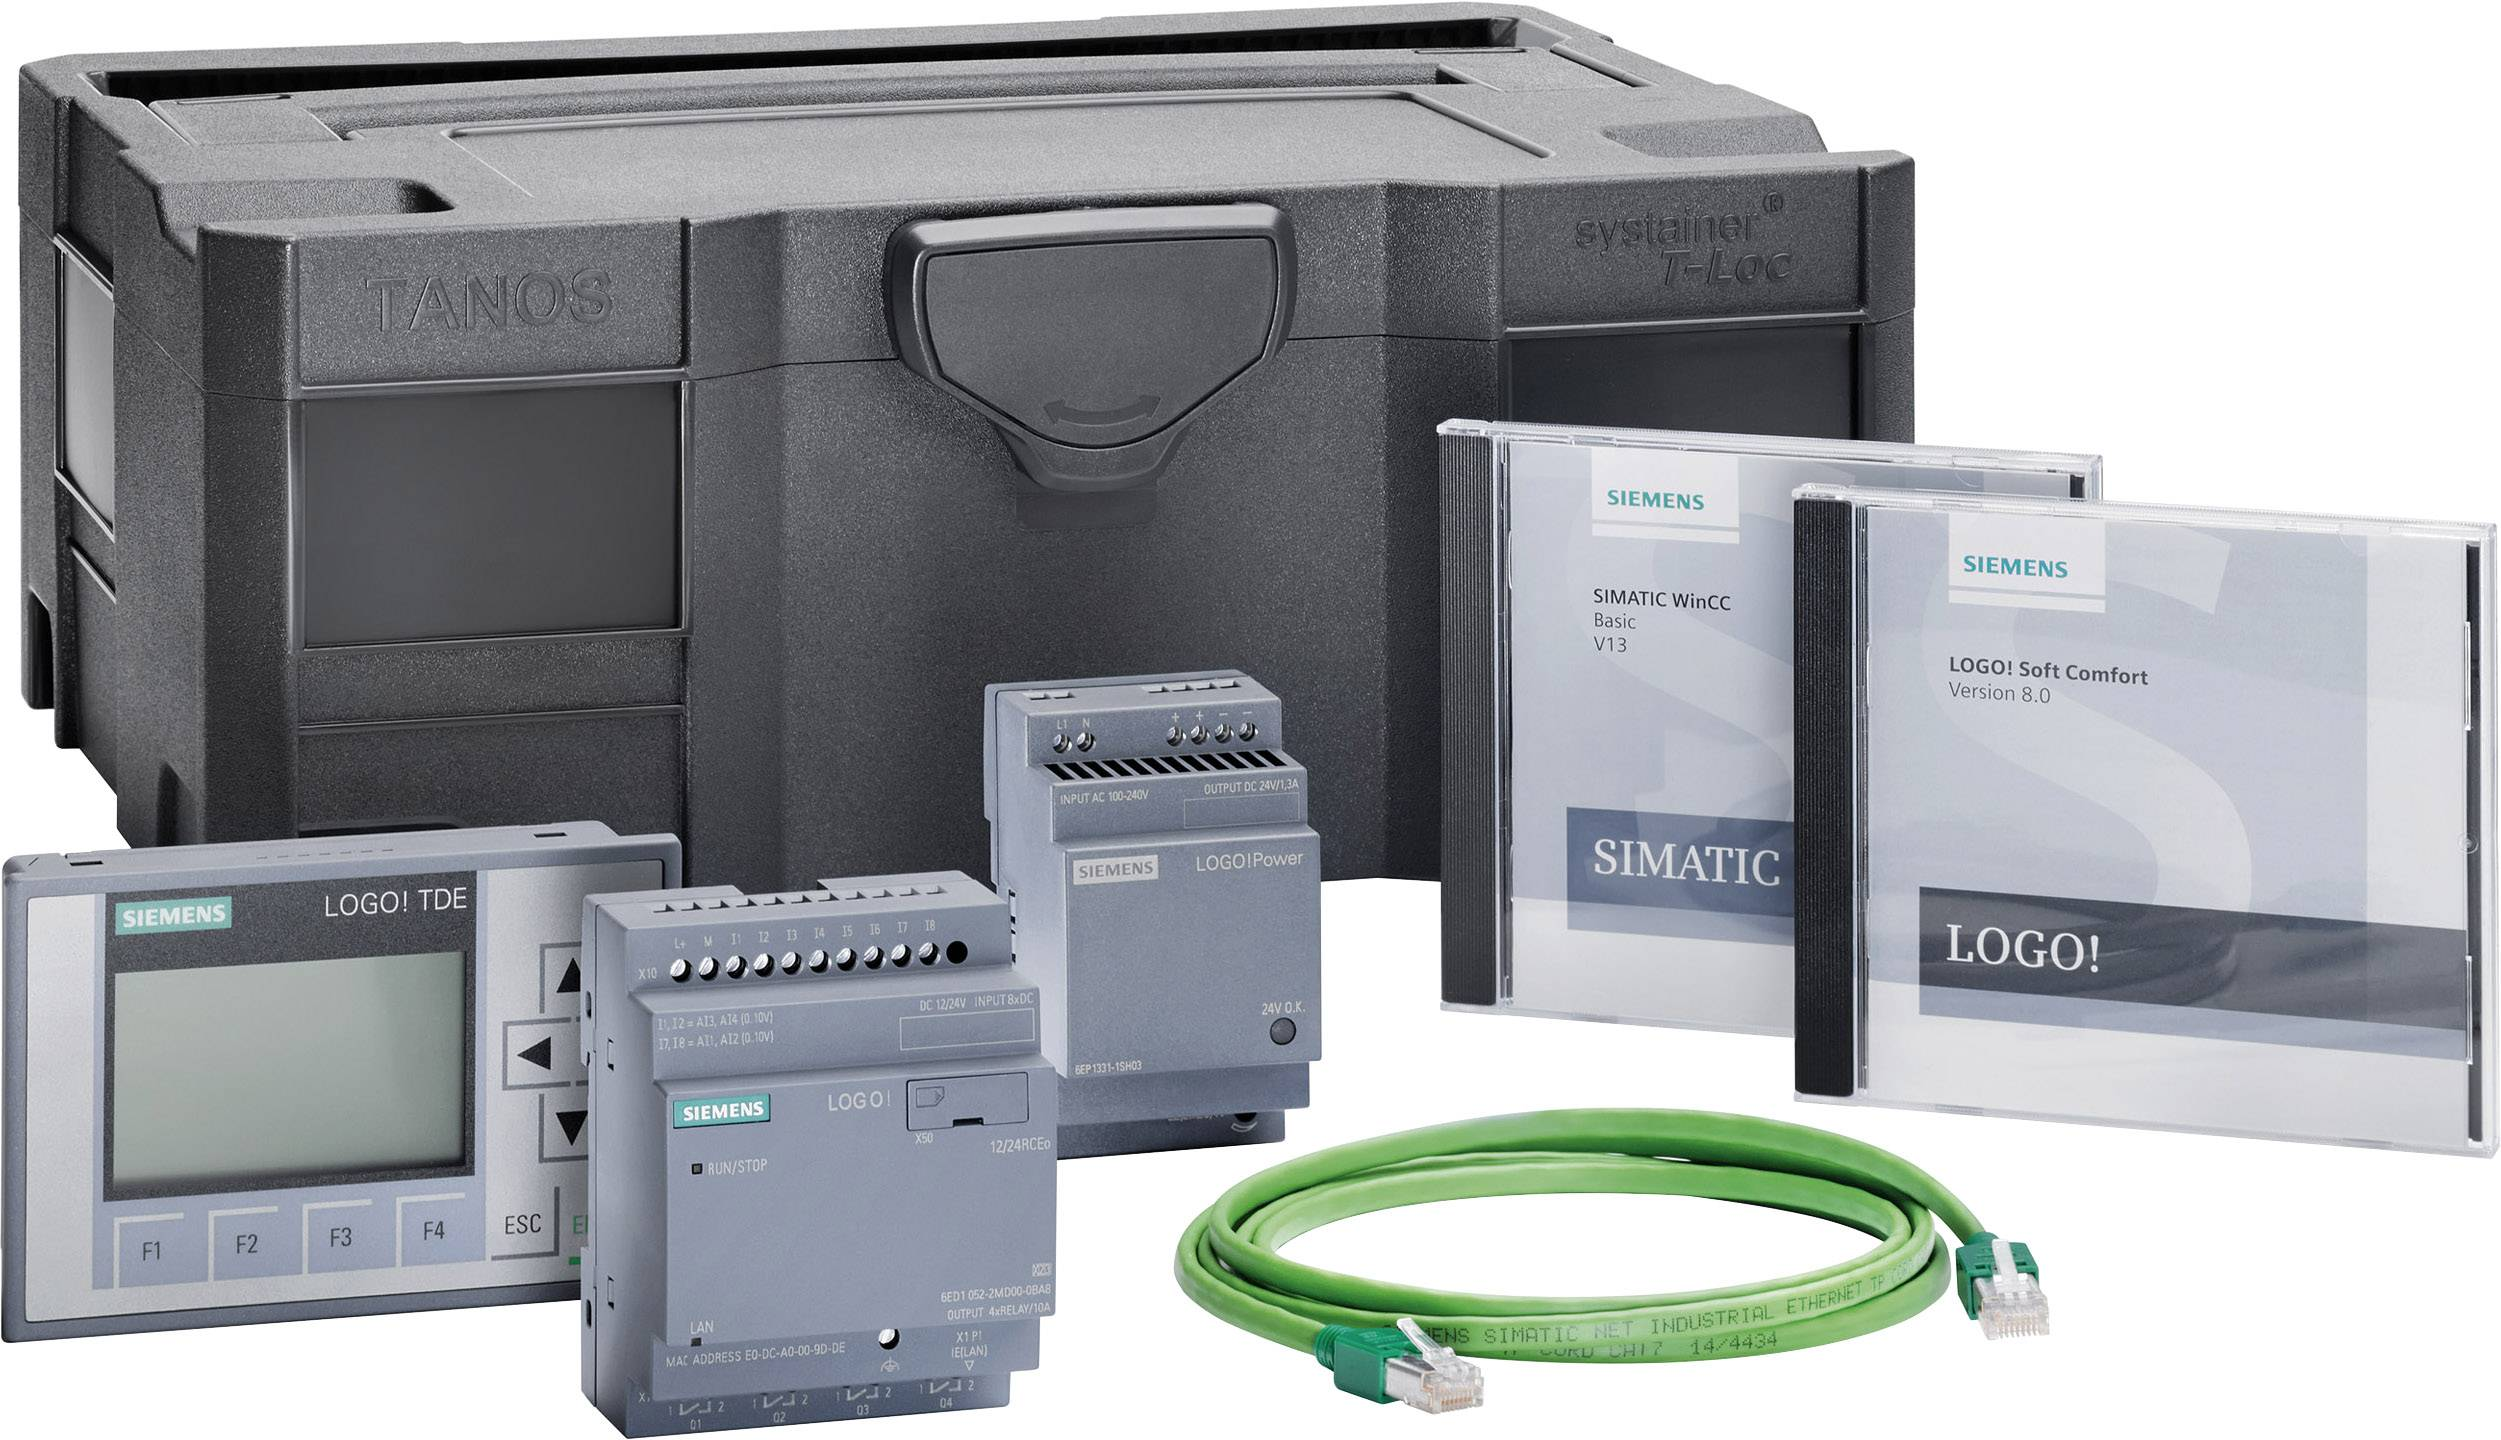 Startovací sada pro PLC Siemens LOGO! TD STARTER KIT 12/24V 6ED1057-3BA11-0AA8, 12 V/DC, 24 V/DC